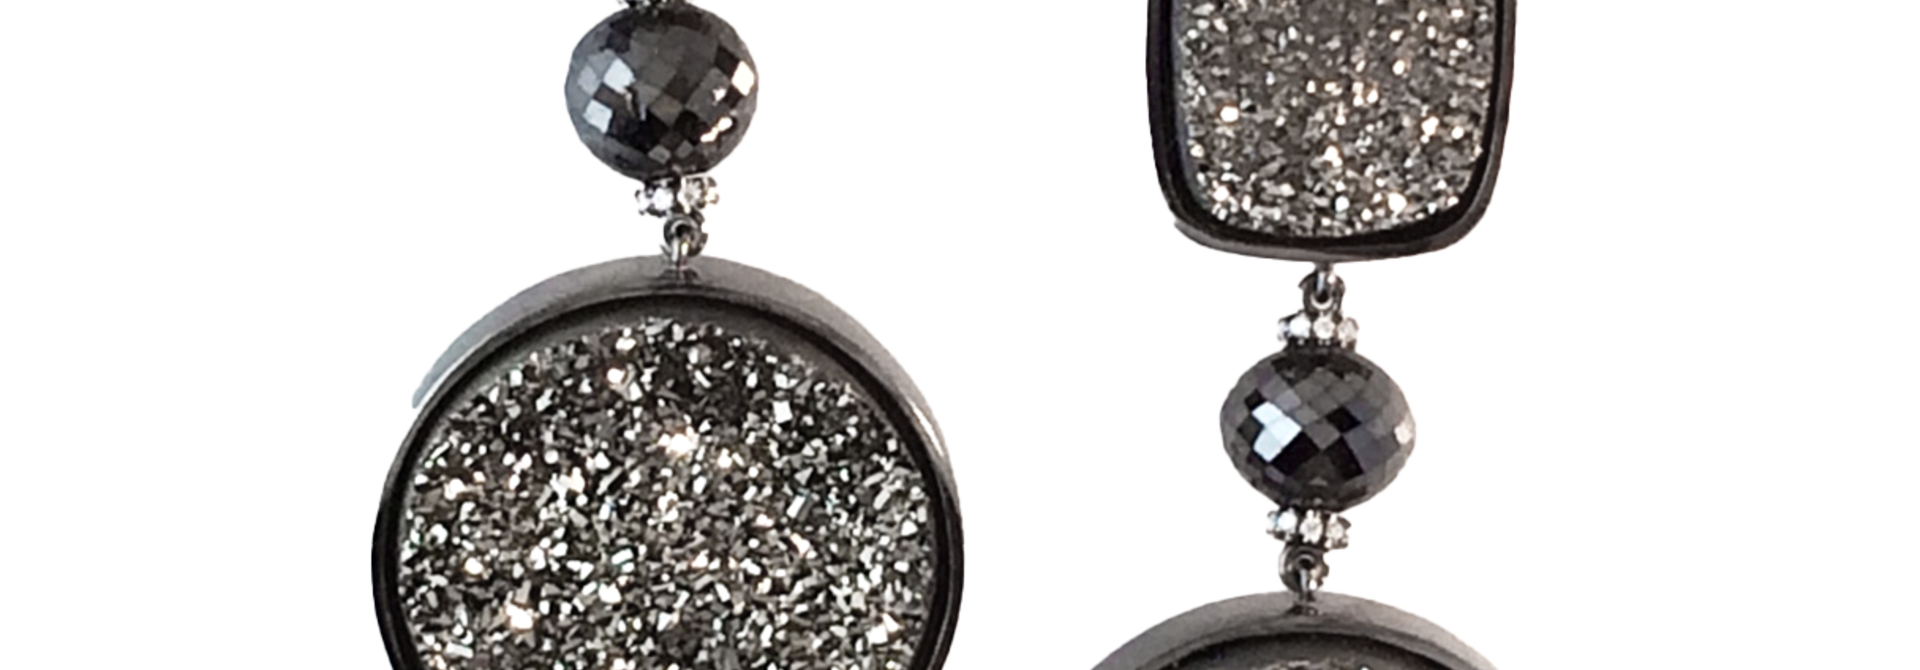 Drusy Quartz and Diamond Earrings